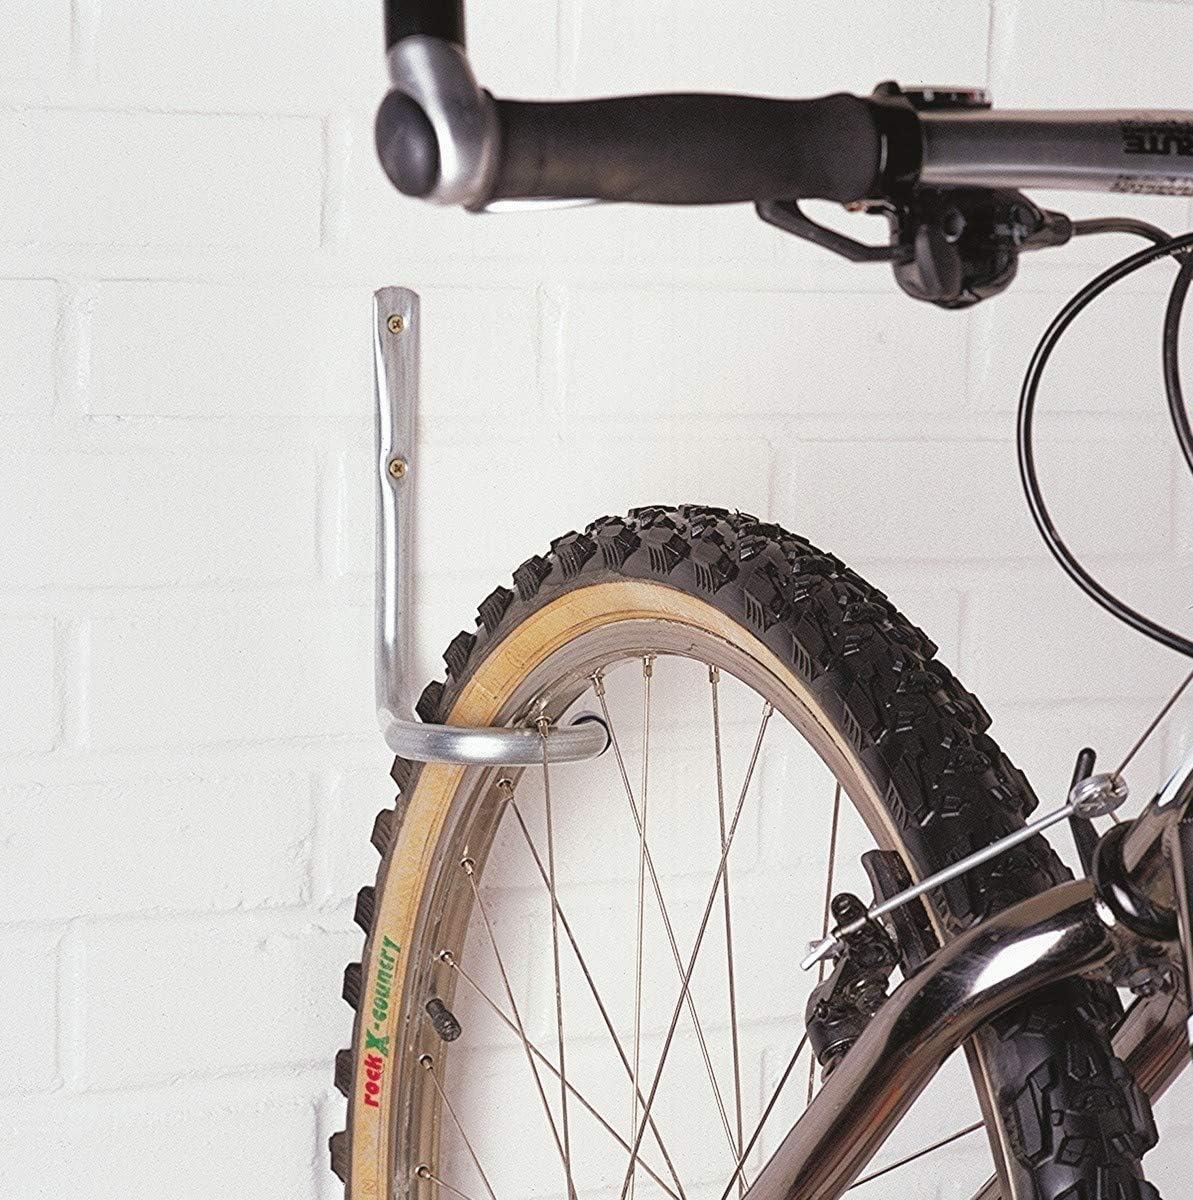 Mottez M77843 - Gancho bicicleta b012v: Amazon.es: Bricolaje y ...